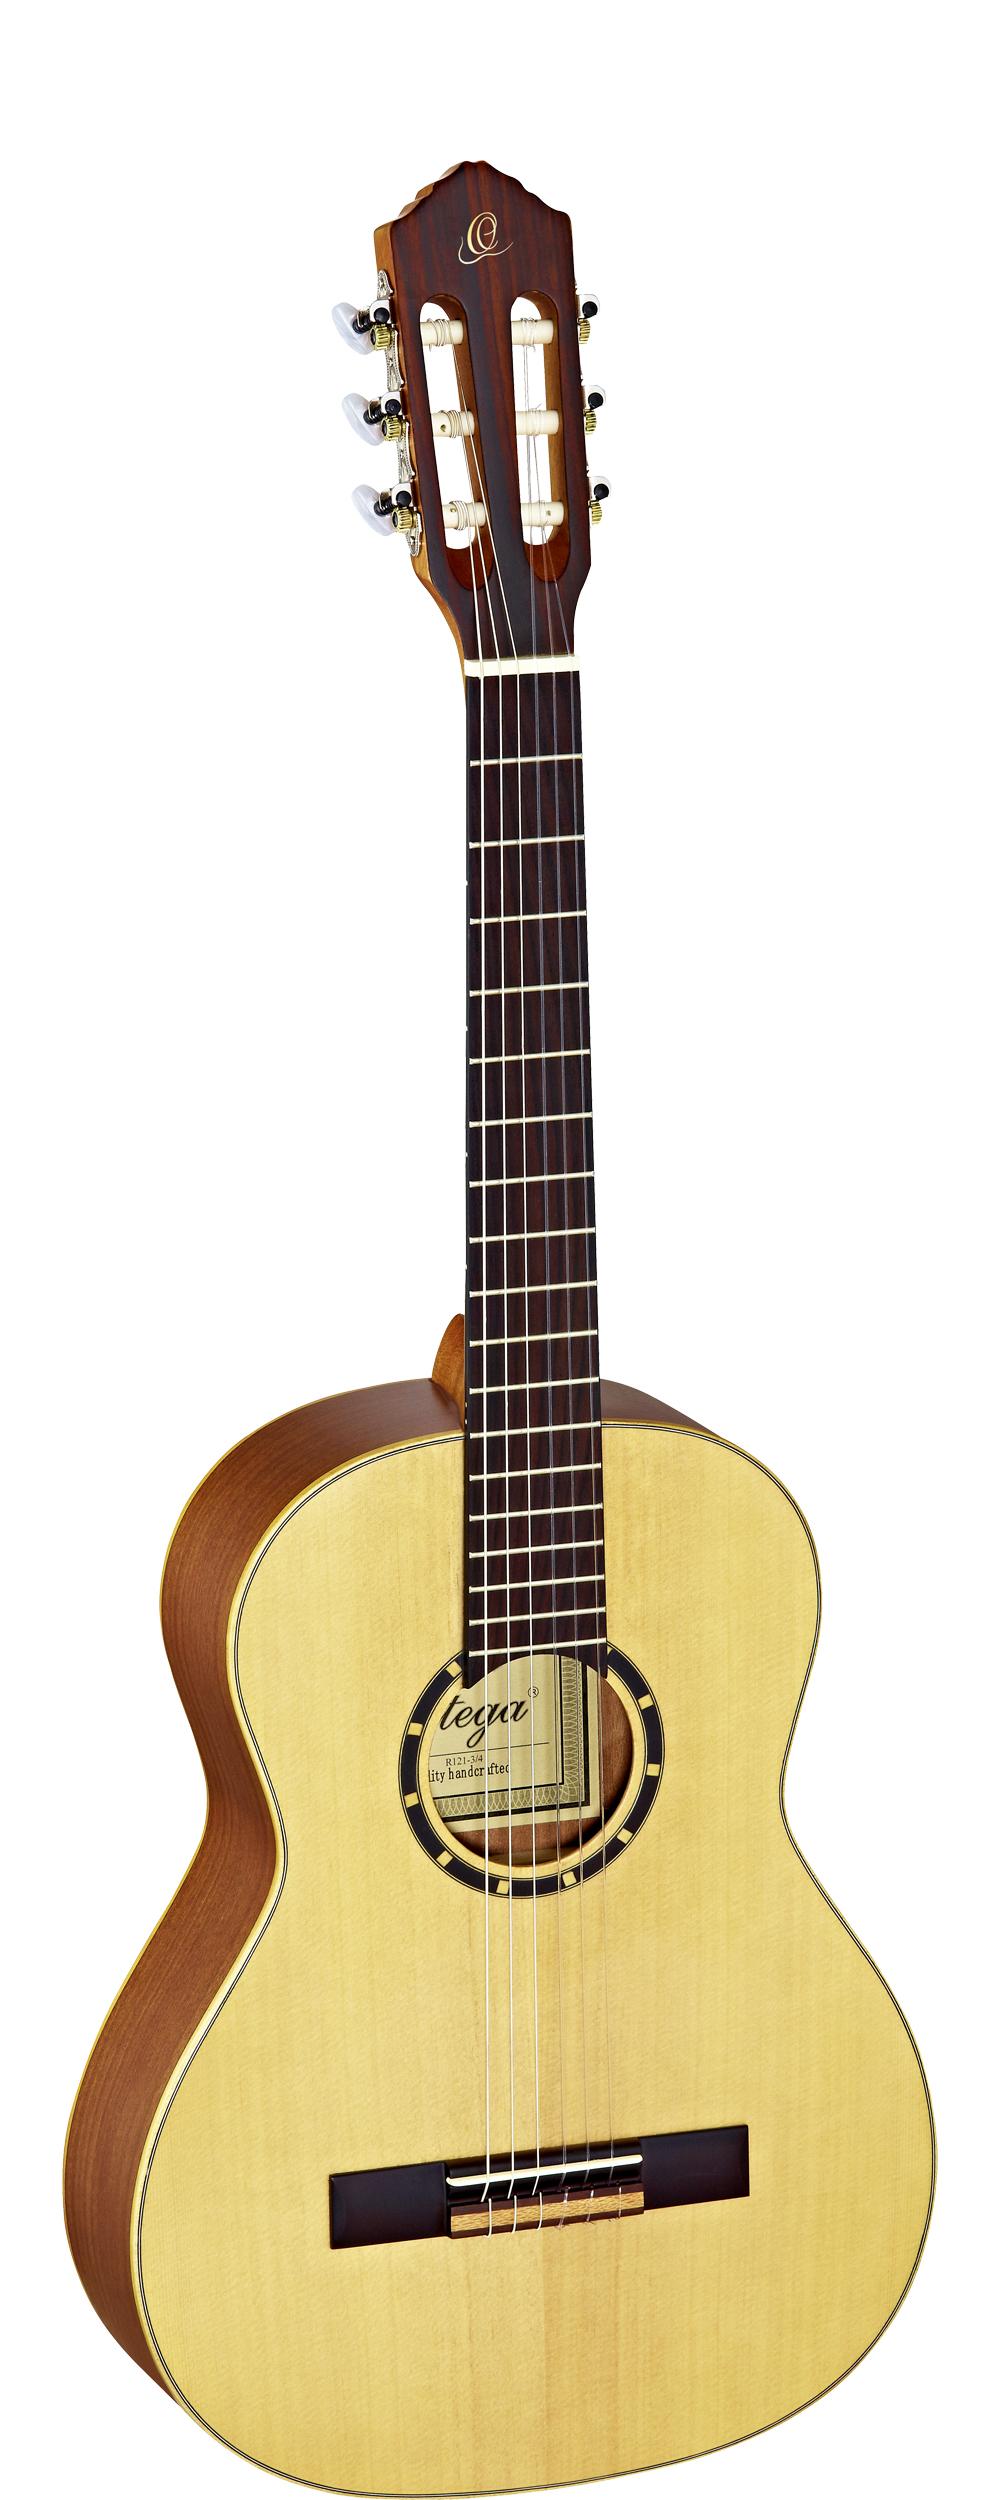 Ortega R 121 3/4 Konzertgitarre